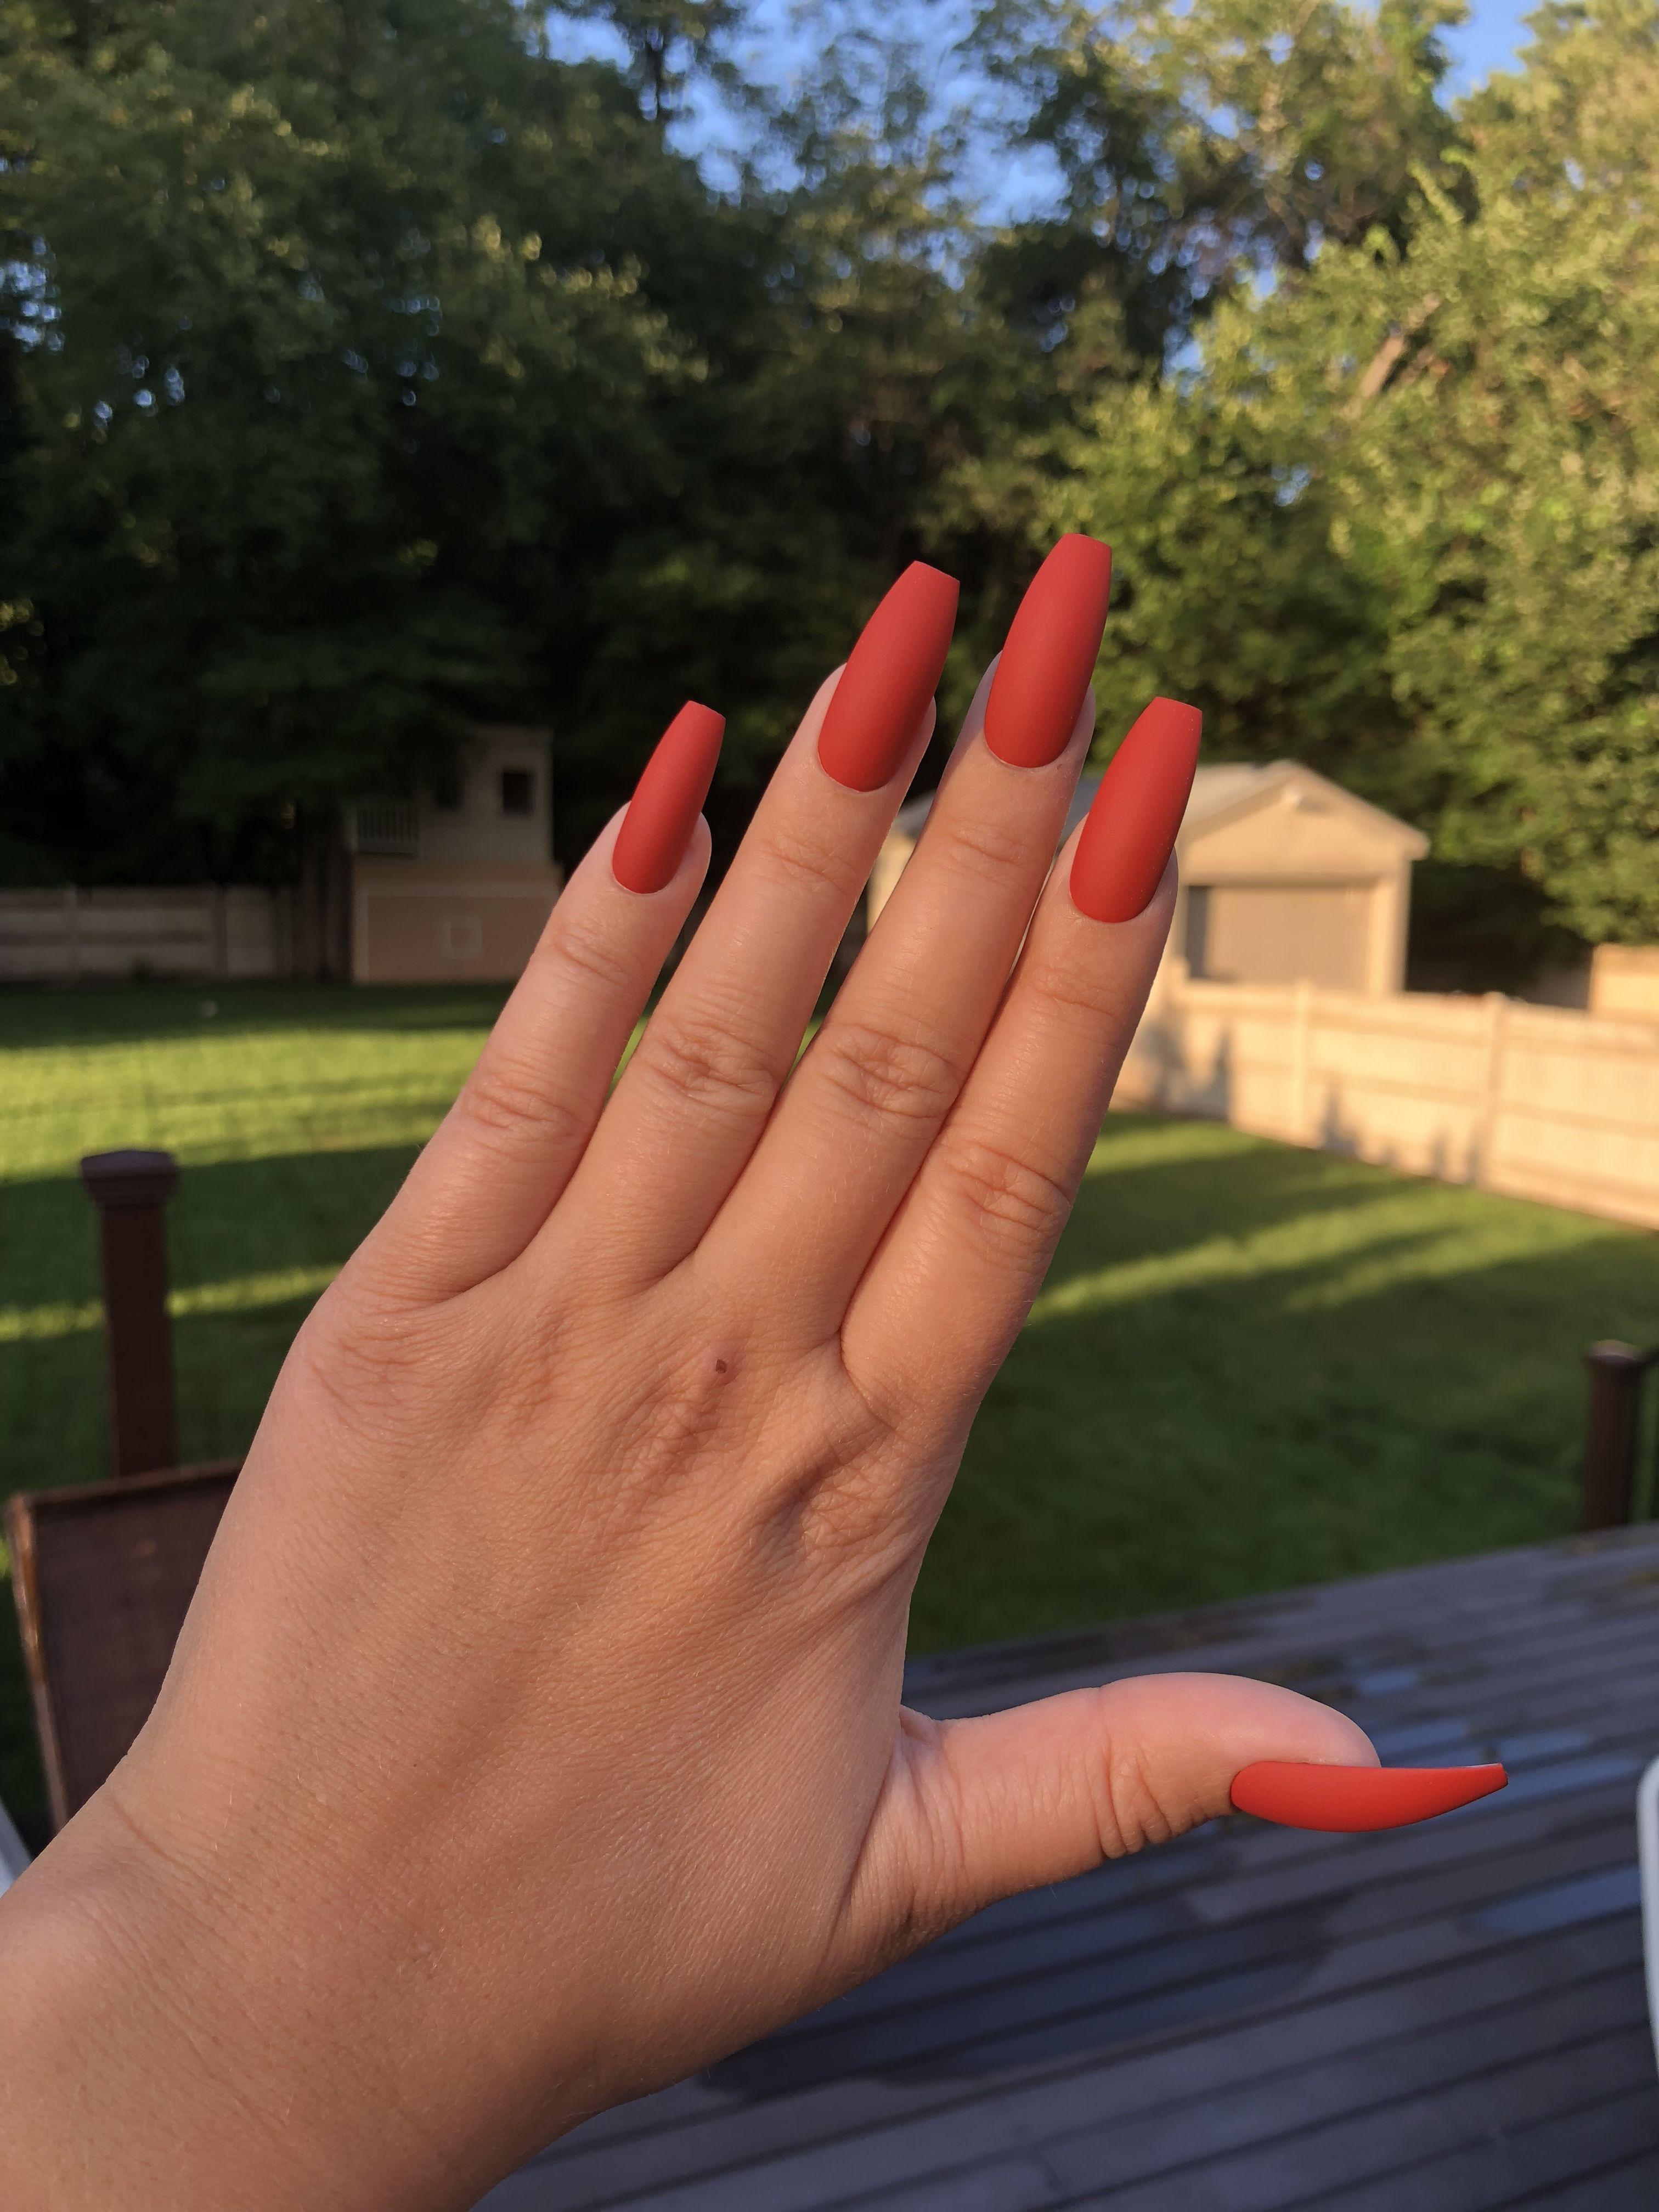 Burnt Orange Nails False Nails Press On Nails Fake Nails Stick On Nails Coffin Or Ballerina Nails Glue On Nails Short Coffin In 2020 Orange Acrylic Nails Orange Nails Glue On Nails